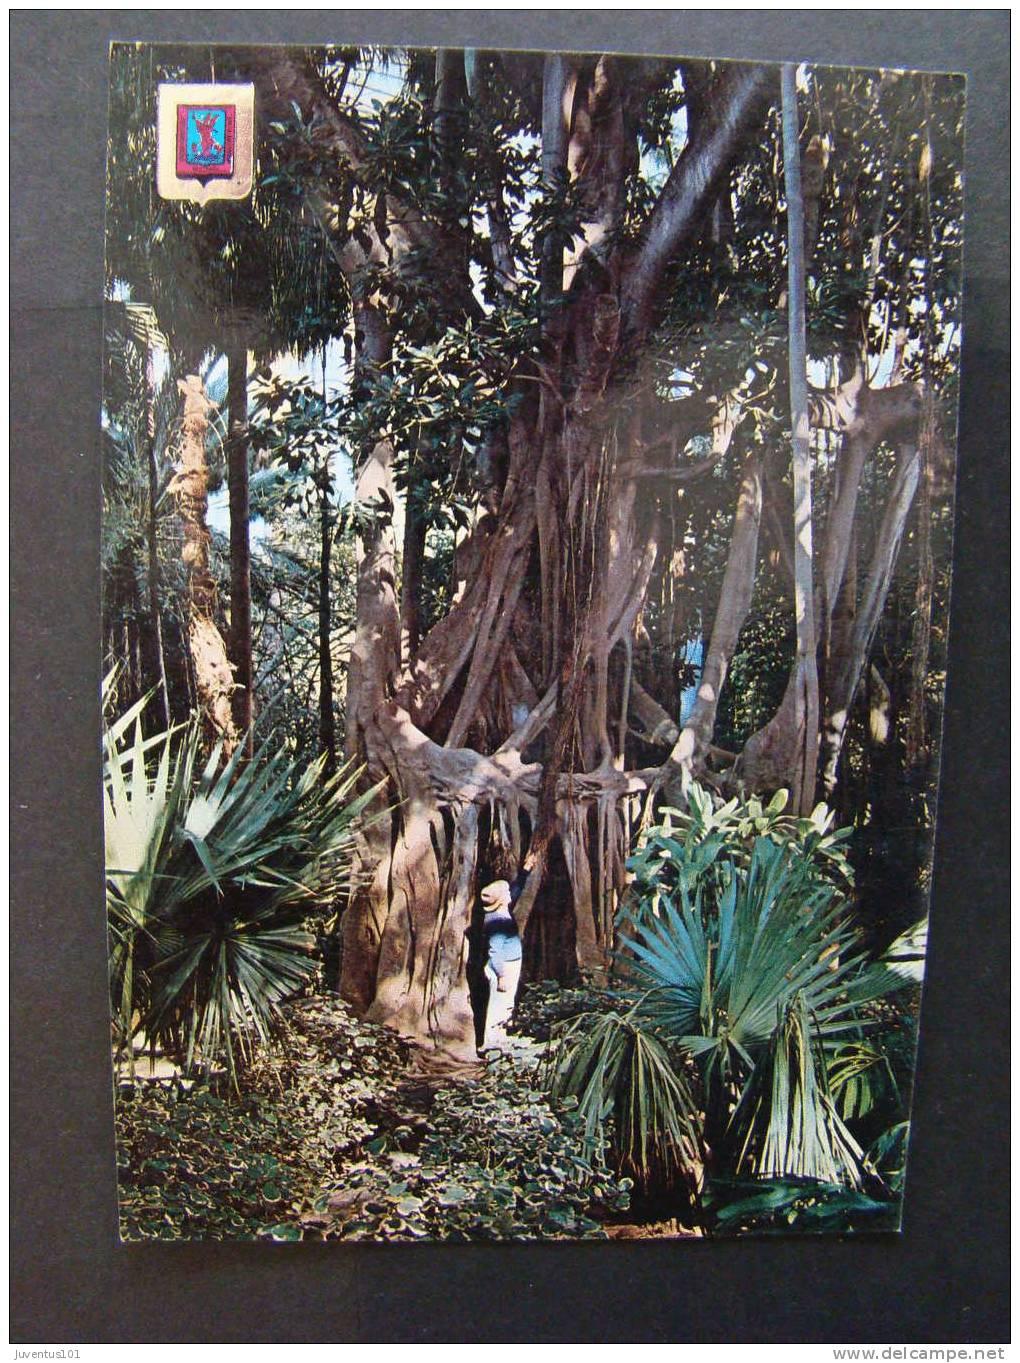 Cpsm espagne tenerife la orotava arbol del caucho en el for Arboles del jardin botanico